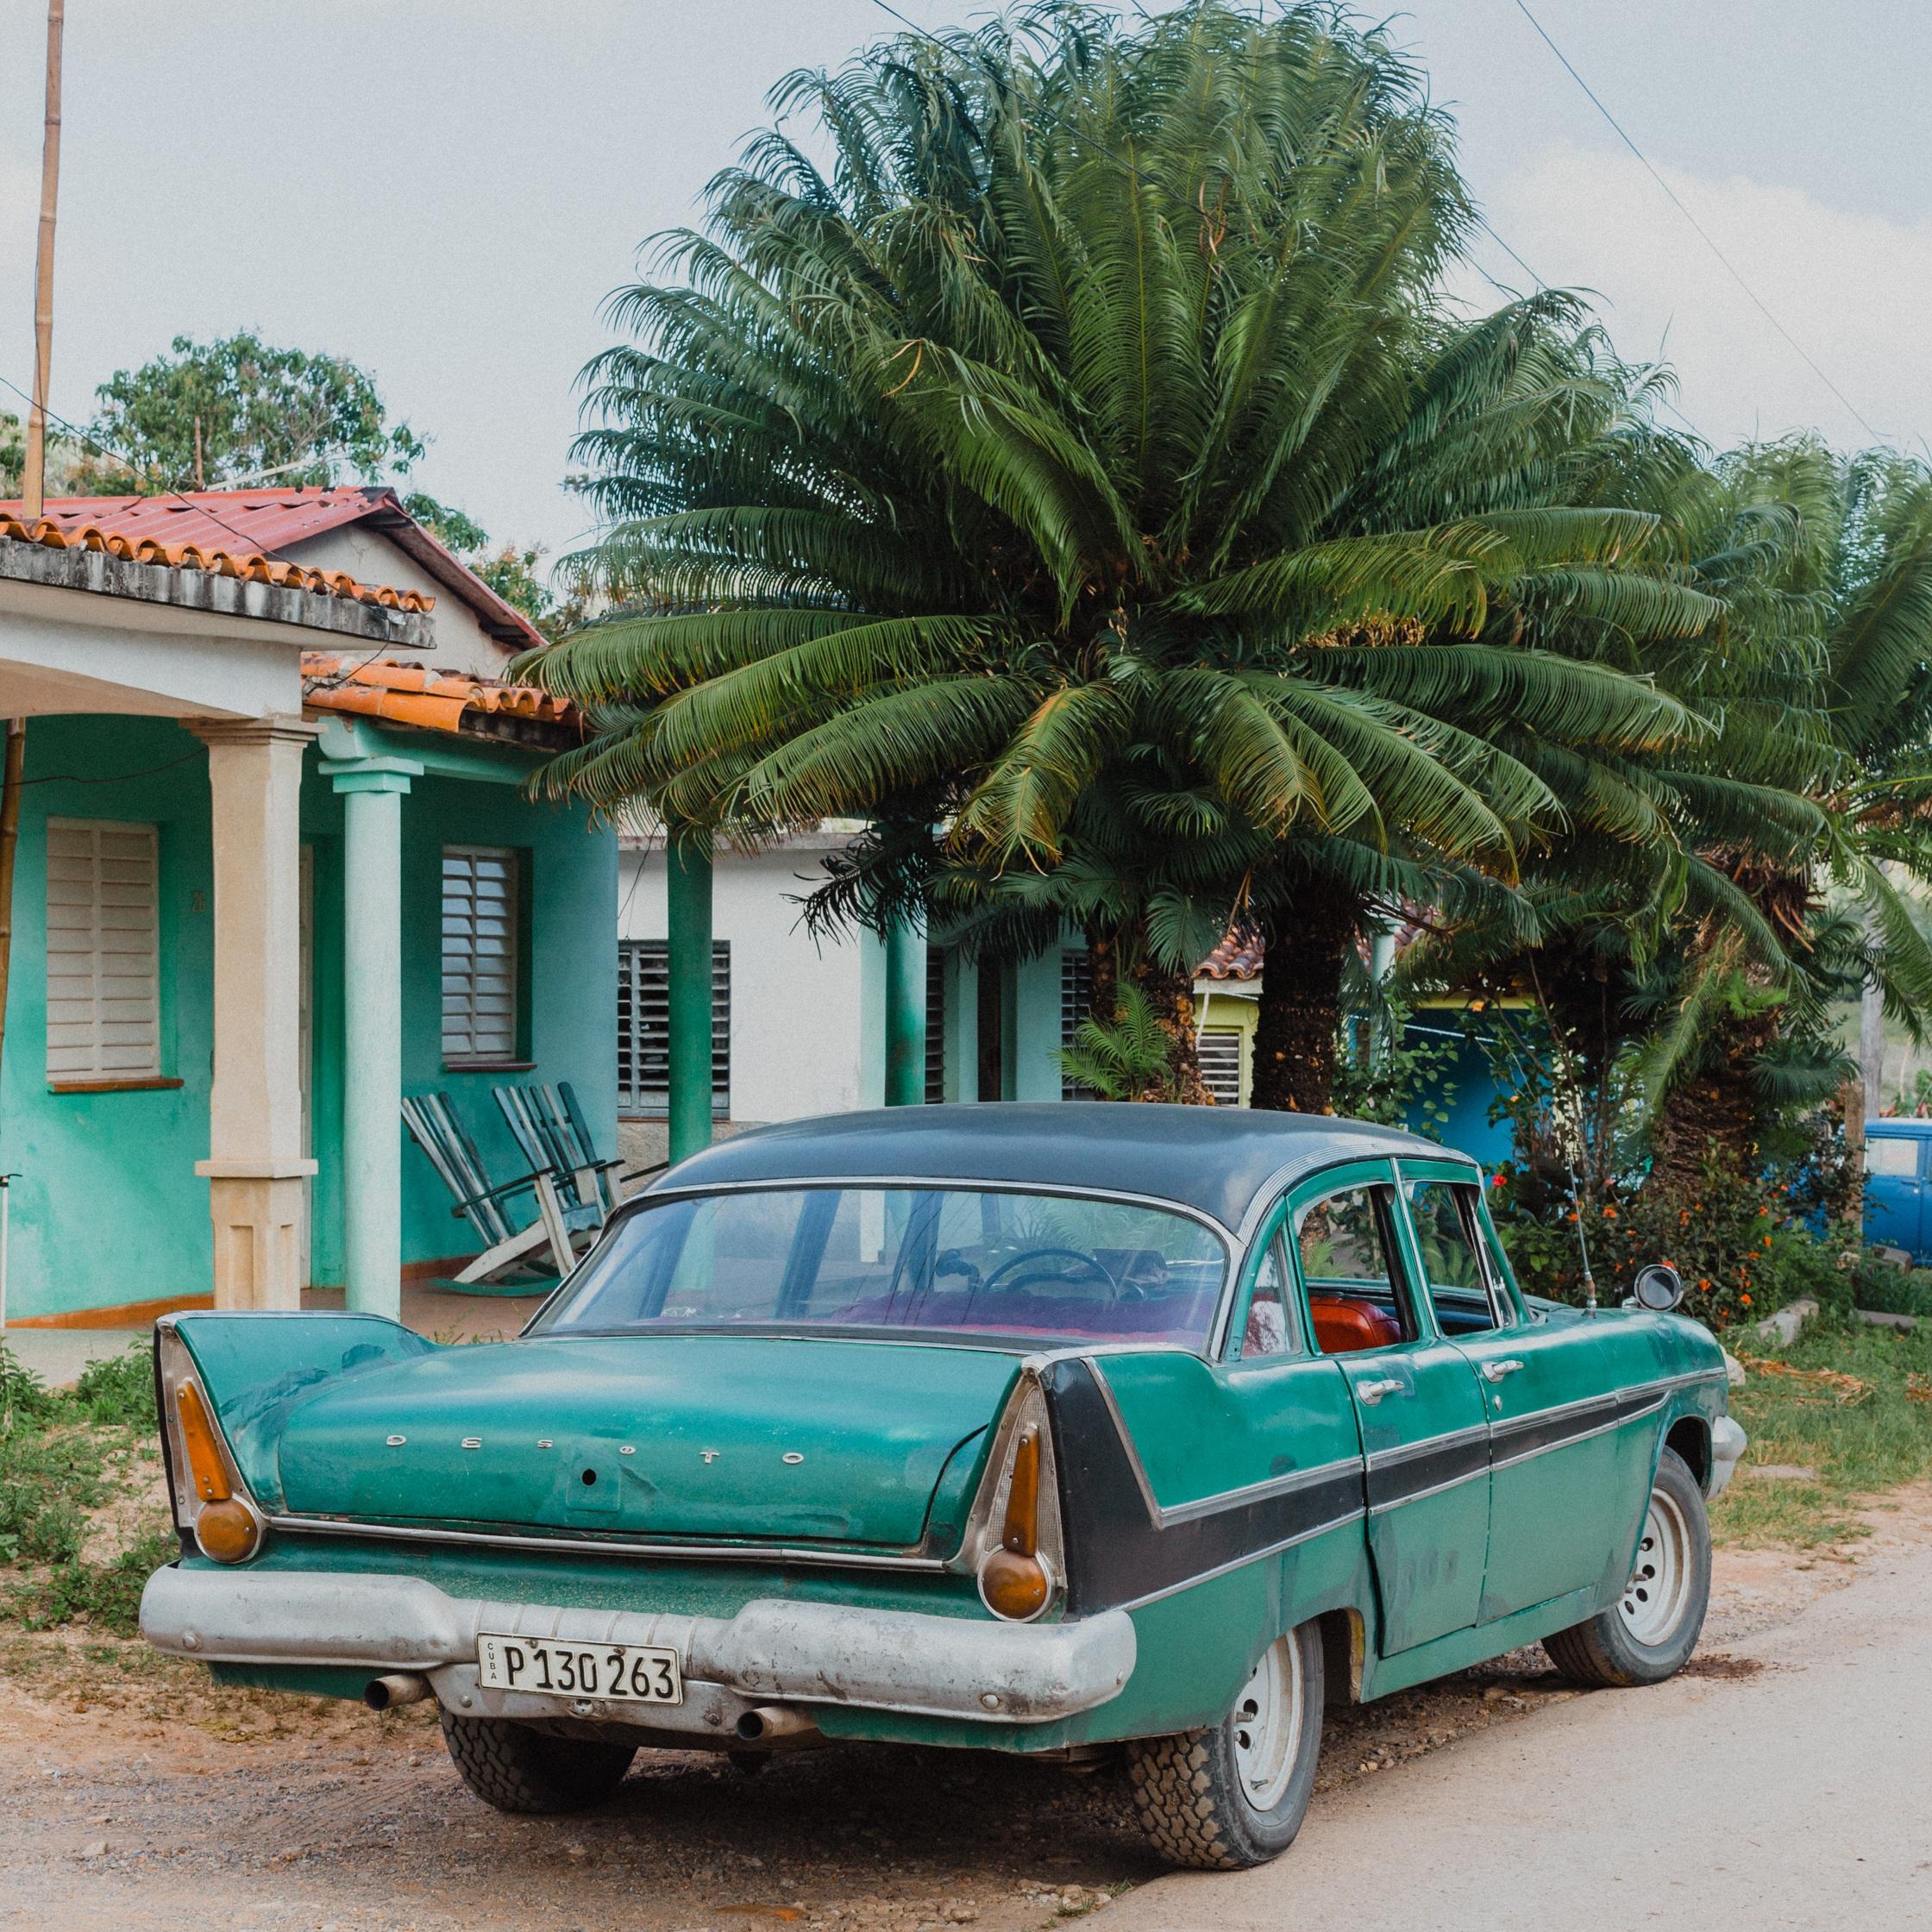 CMR-OO-Cuba-Feb2019-9585.jpg